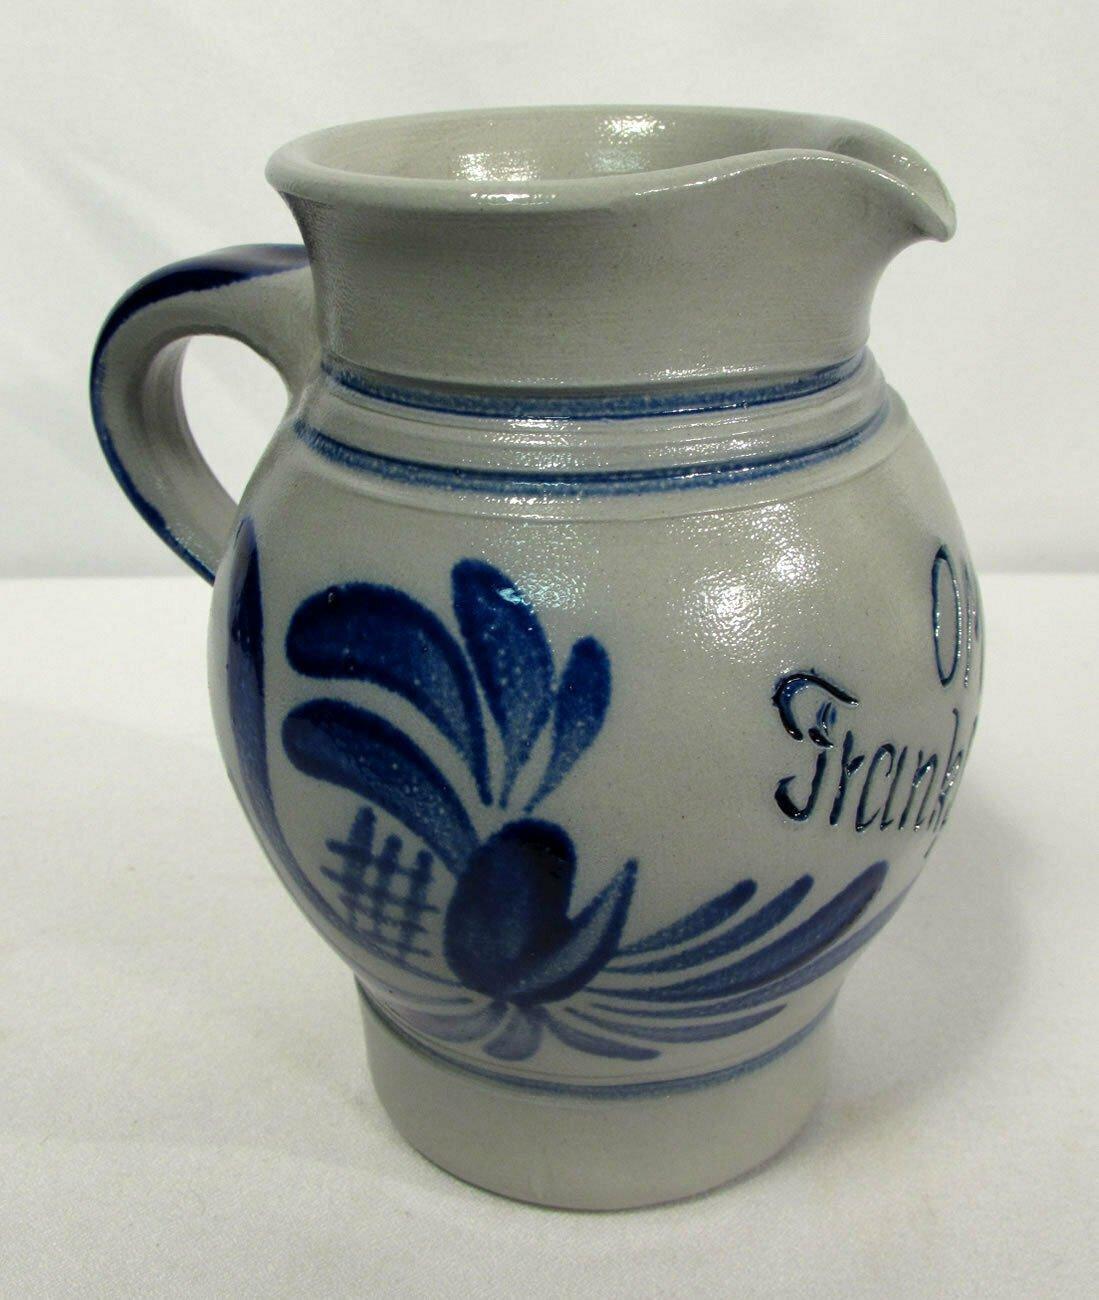 2002 Handarbeit German Salt Glazed Stoneware Pitcher Cobalt Blue 0.5L NICE